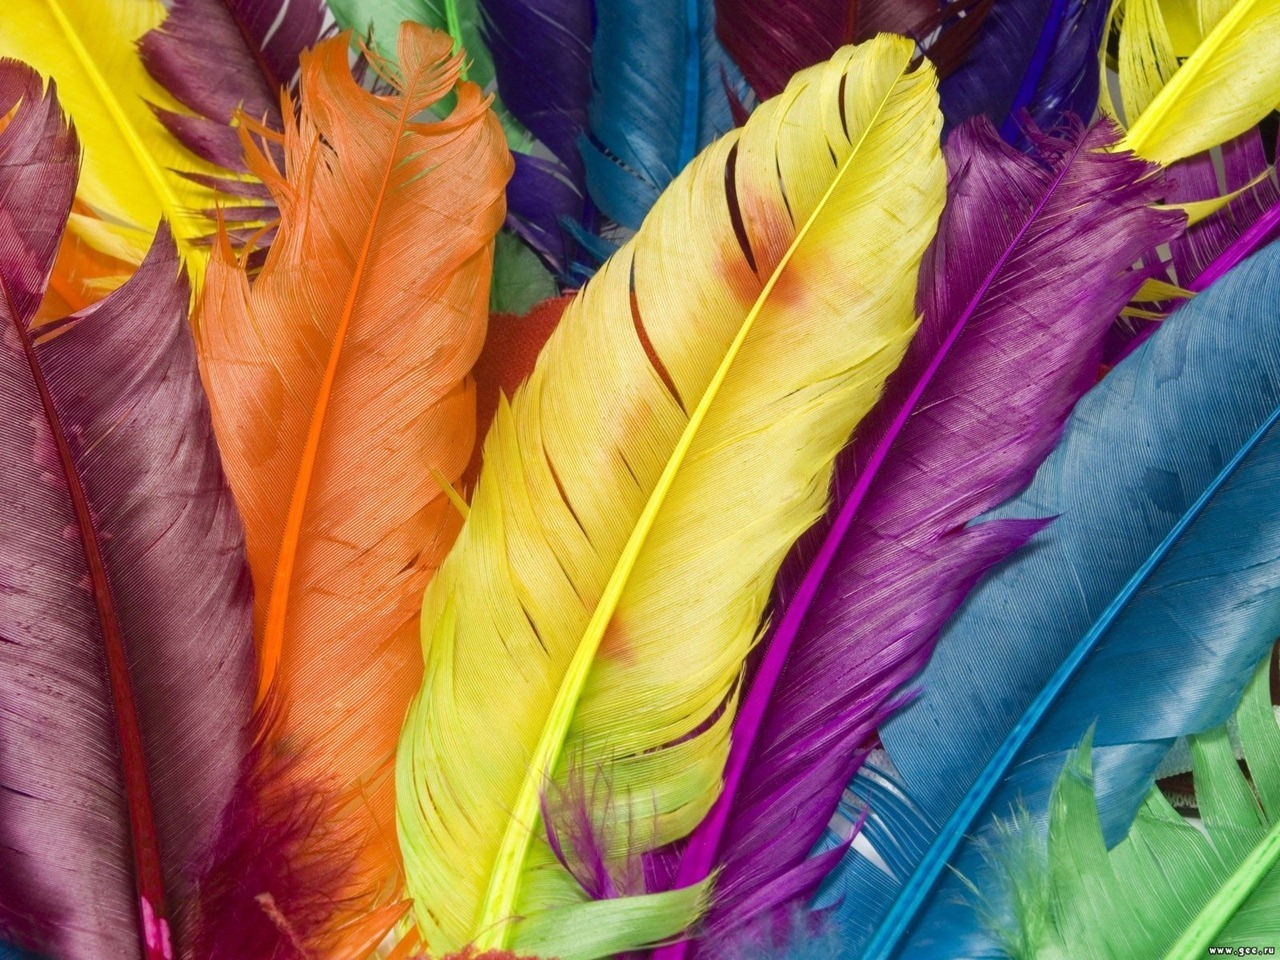 Colorful Desktop Wallpaper wallpaper Colorful Desktop Wallpaper hd 1280x960